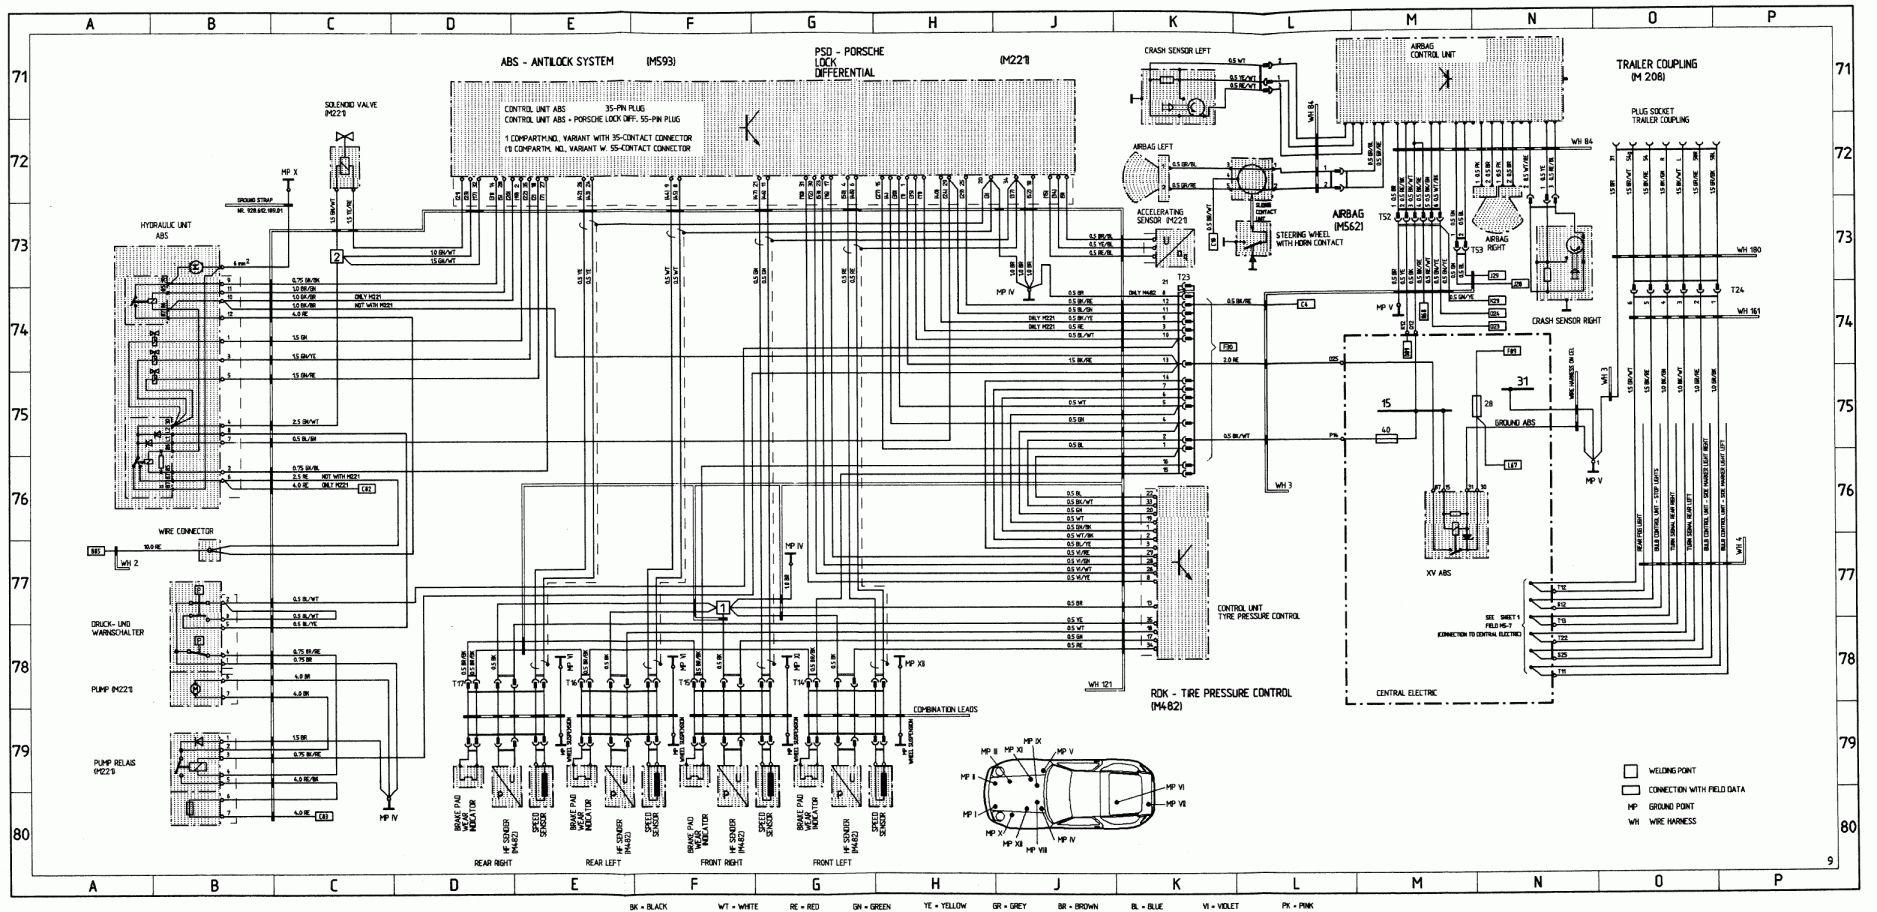 12 Bmw F650gs Electrical Wiring Diagram Wiring Diagram Wiringg Net Electrical Wiring Diagram Bmw E46 Electrical Wiring